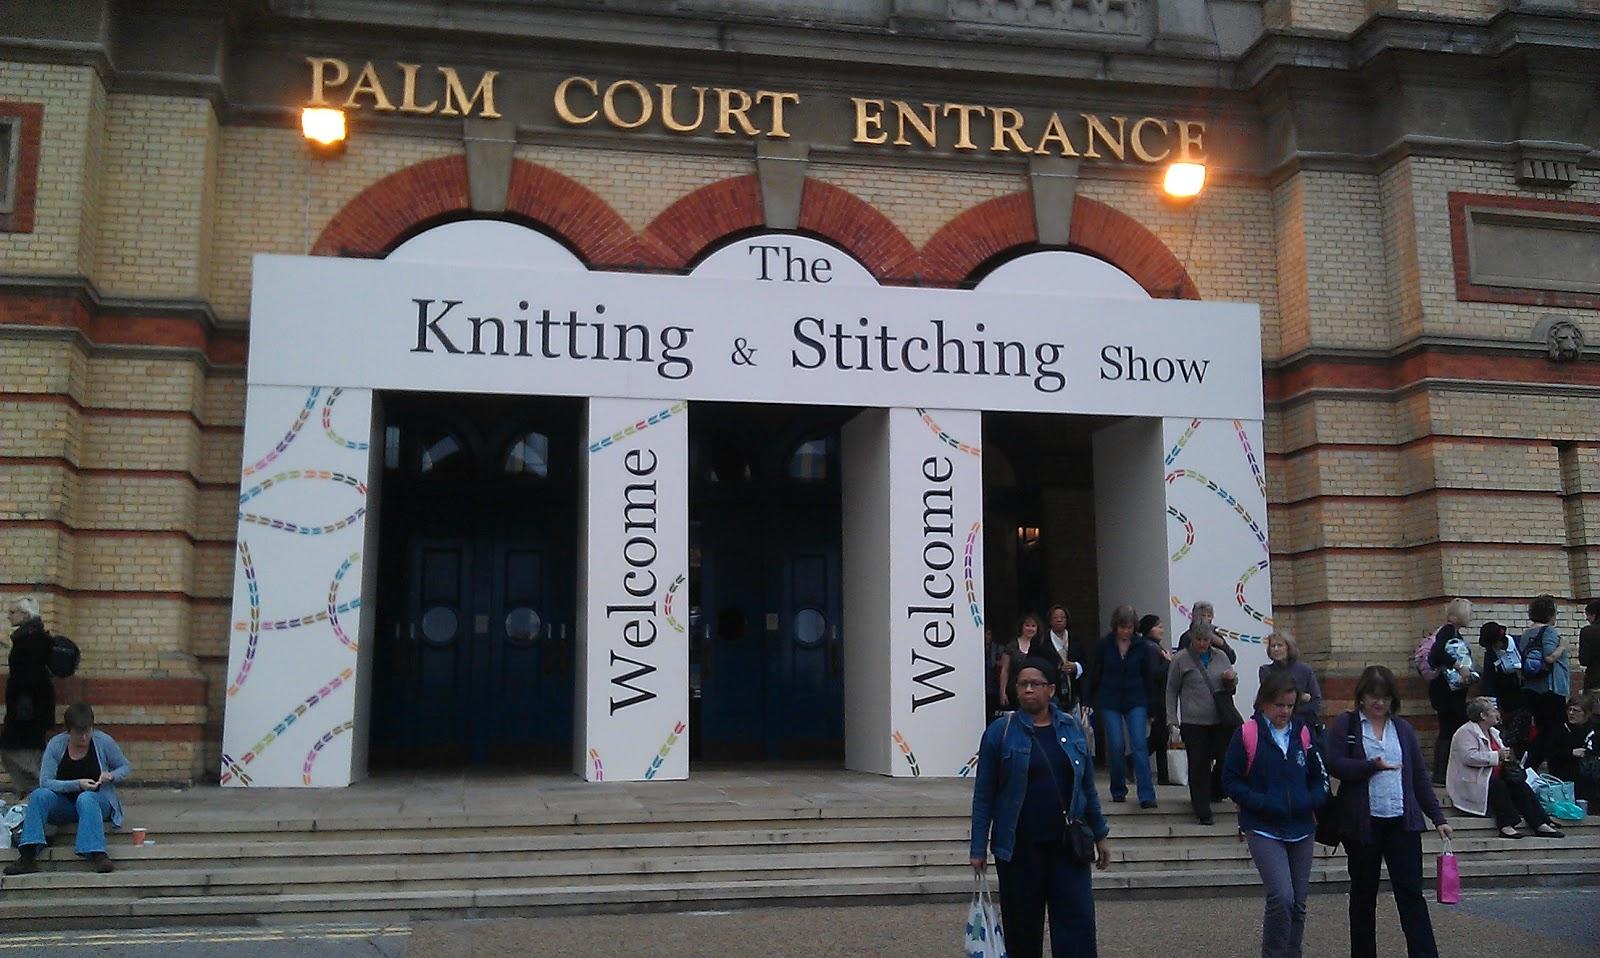 Knitting And Stitching Show 2017 Ally Pally : Nicole Needles: Ally Pally Knitting and Stitching Show